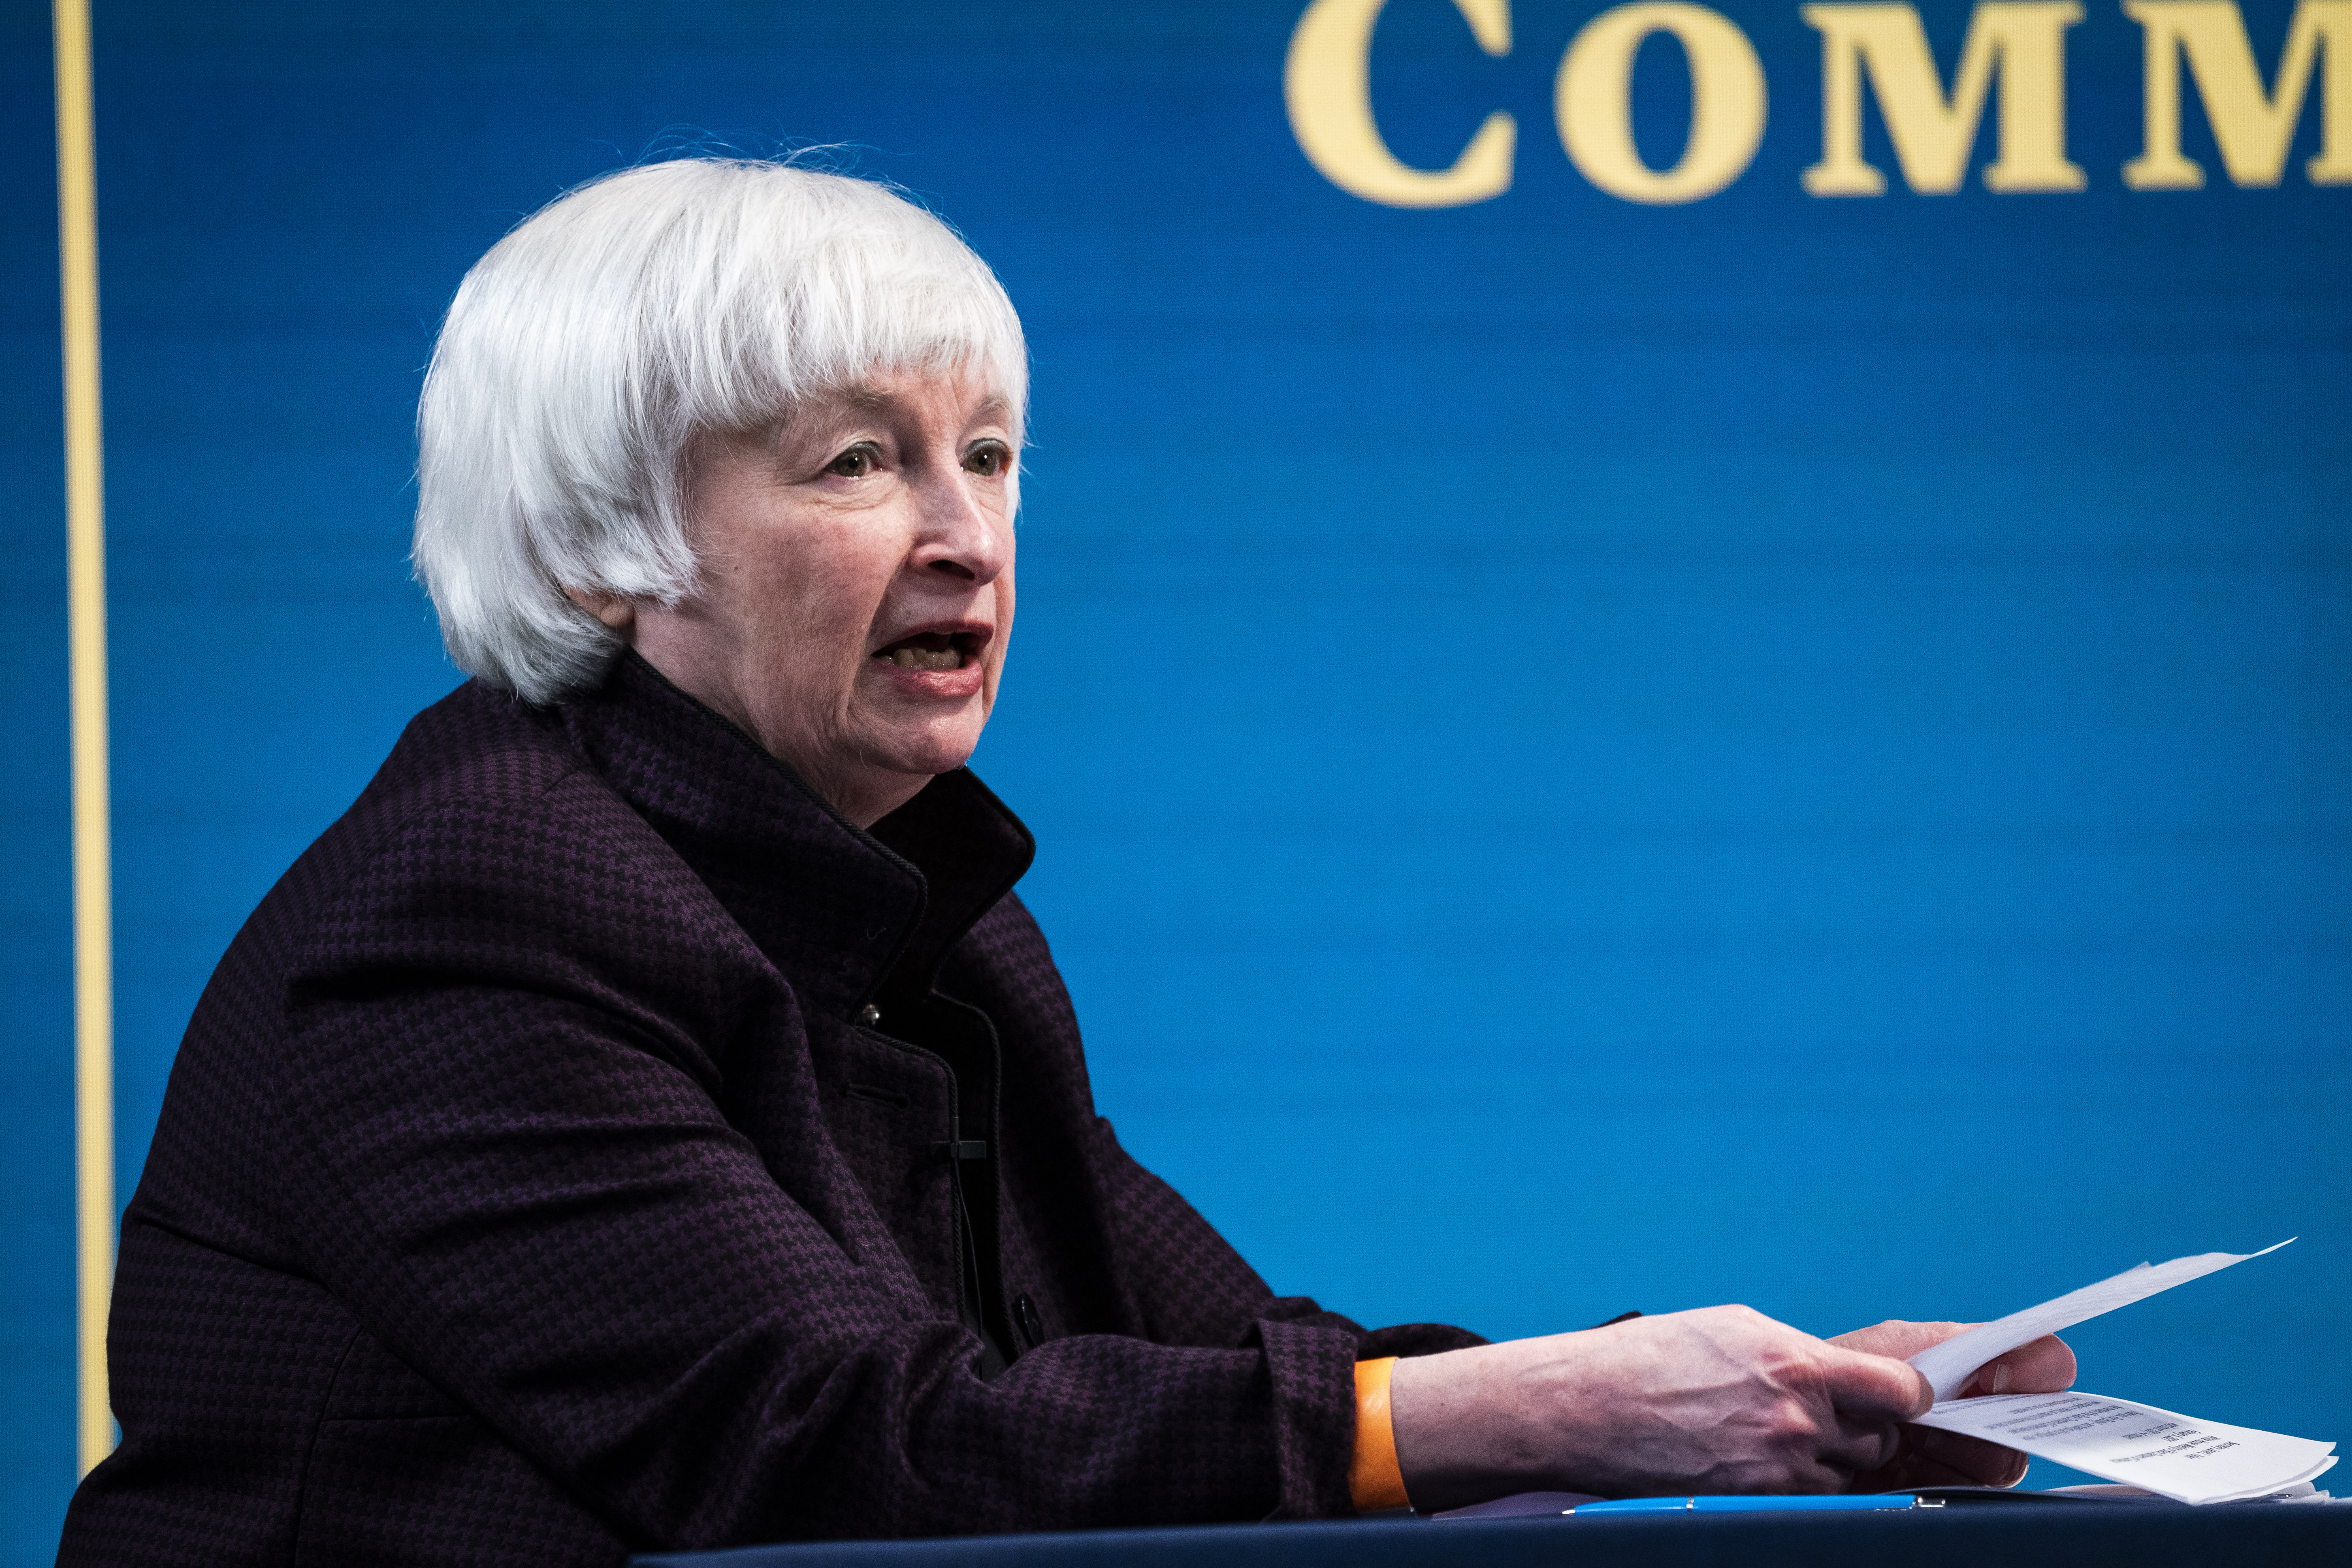 Treasury Secretary Janet Yellen calls estimated $7 trillion tax gap 'shocking and distressing'